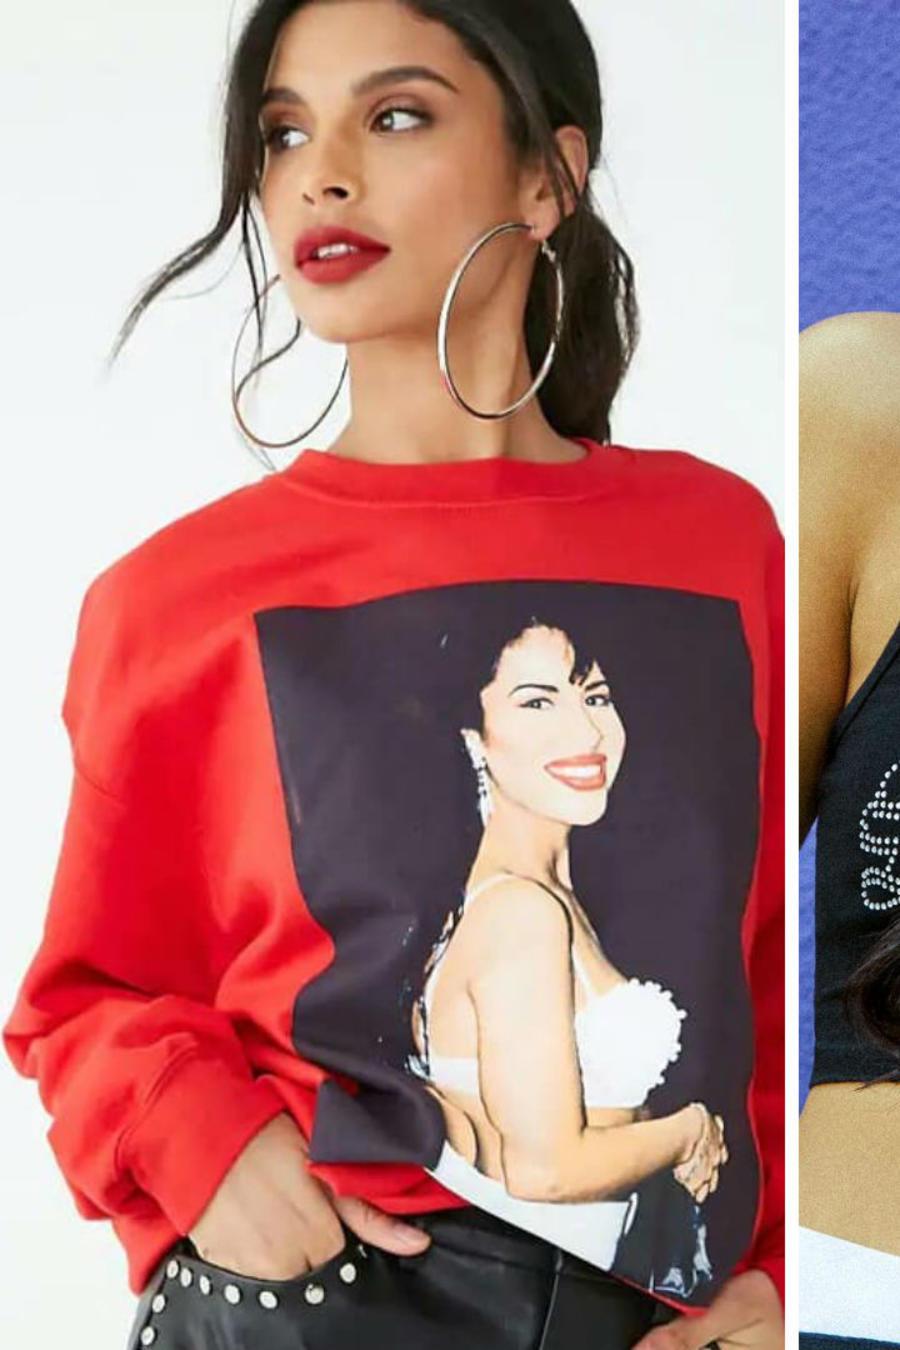 Colección de ropa de Selena Quintanilla